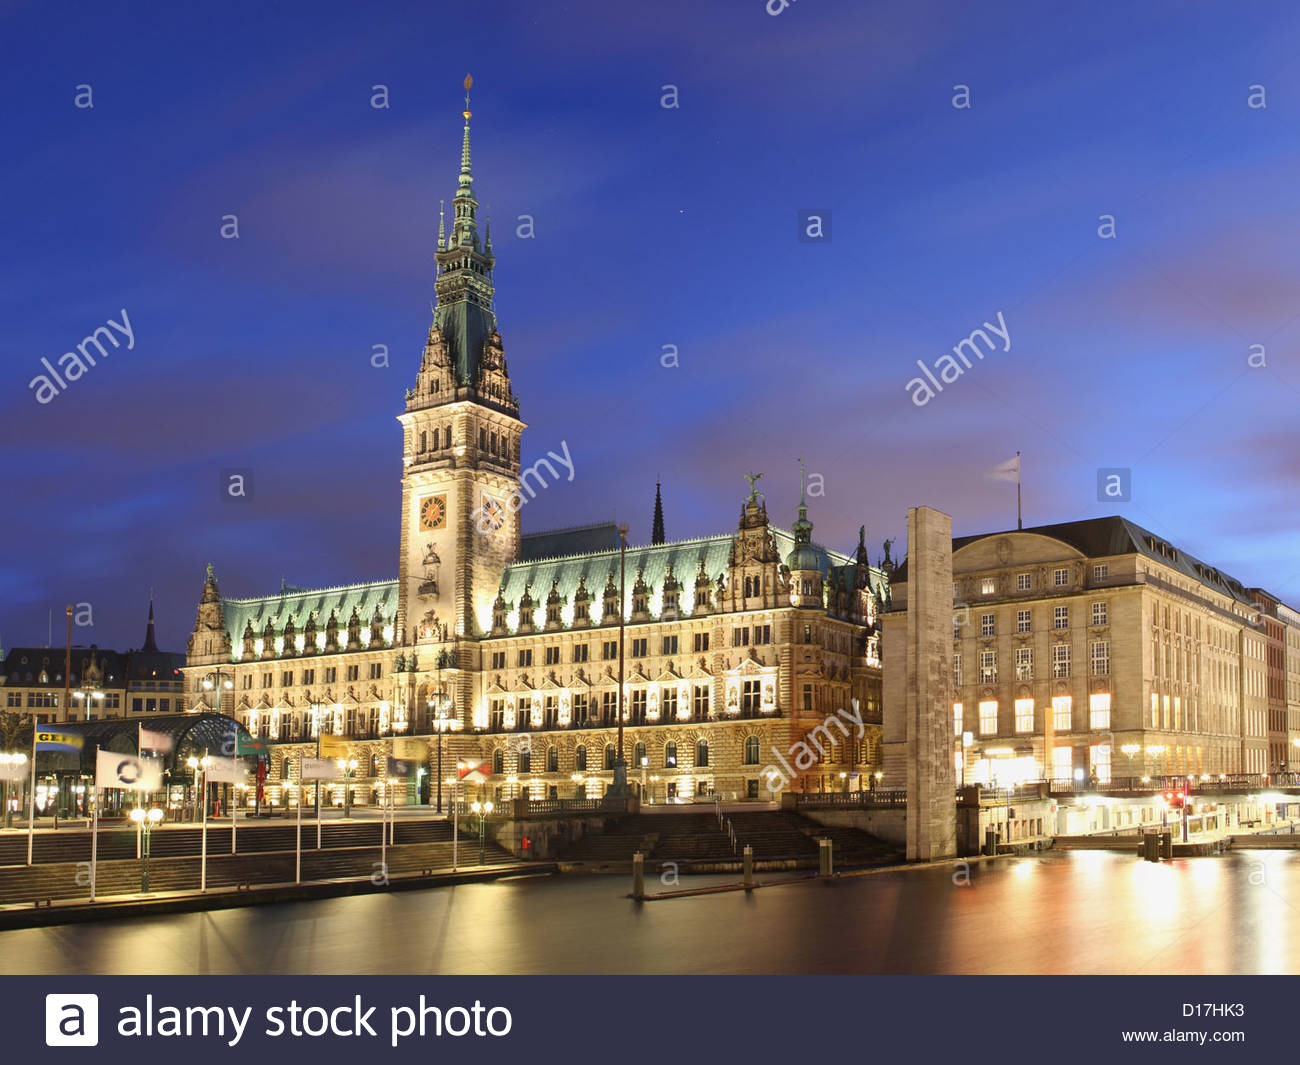 Ornate urban building lit up at night - Stock Image